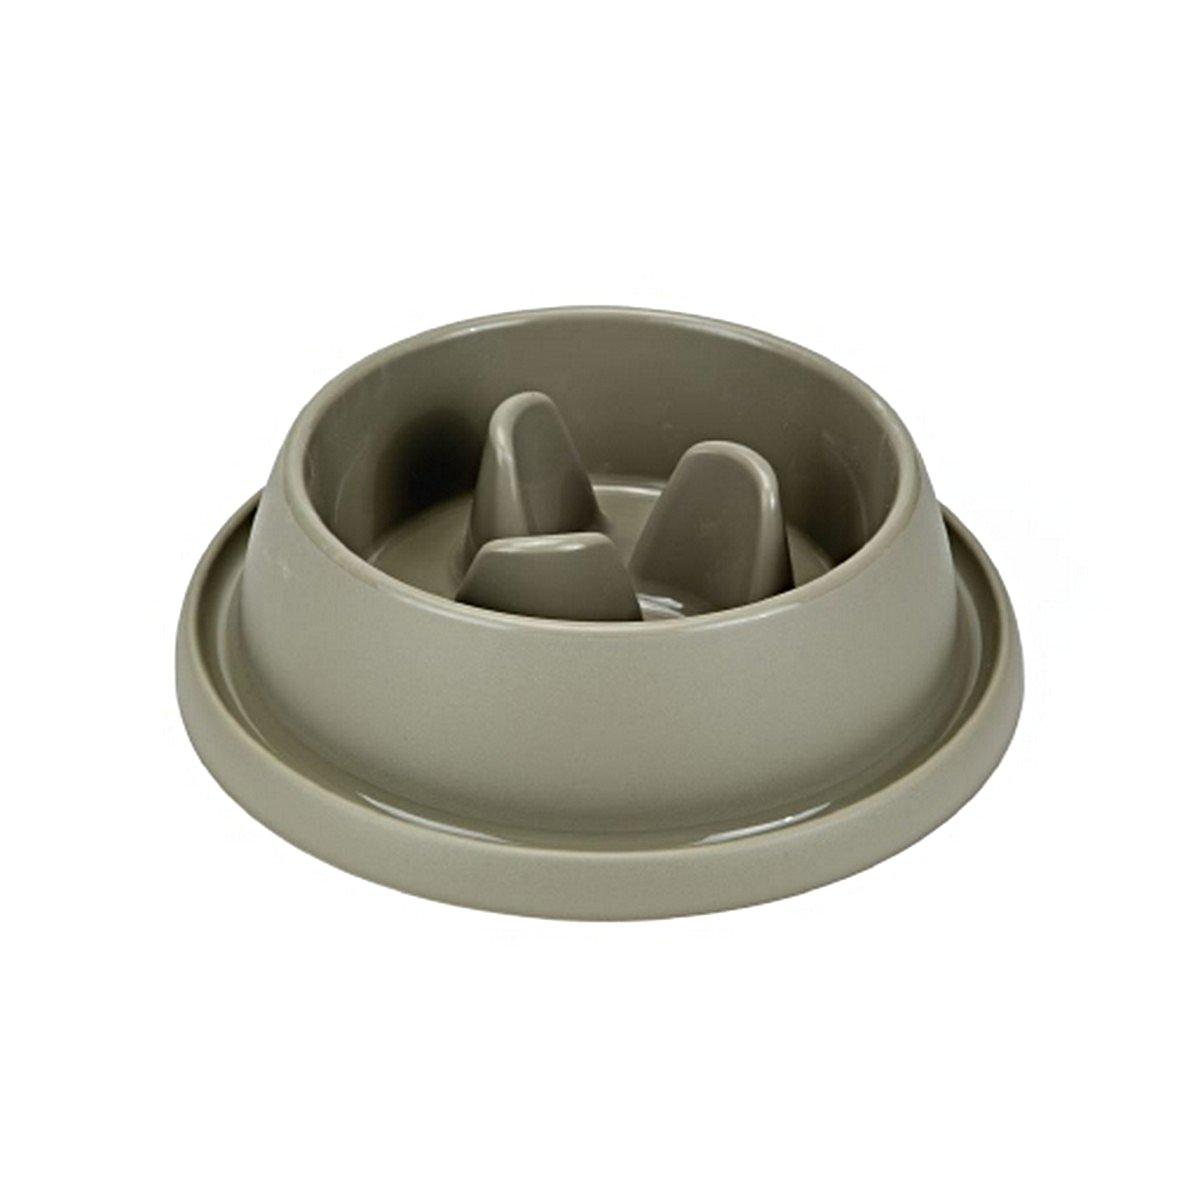 Imagem de Beeztees Anti Scoff Bowl Wico Plastic mocha 31,5cm, 9cm,2l